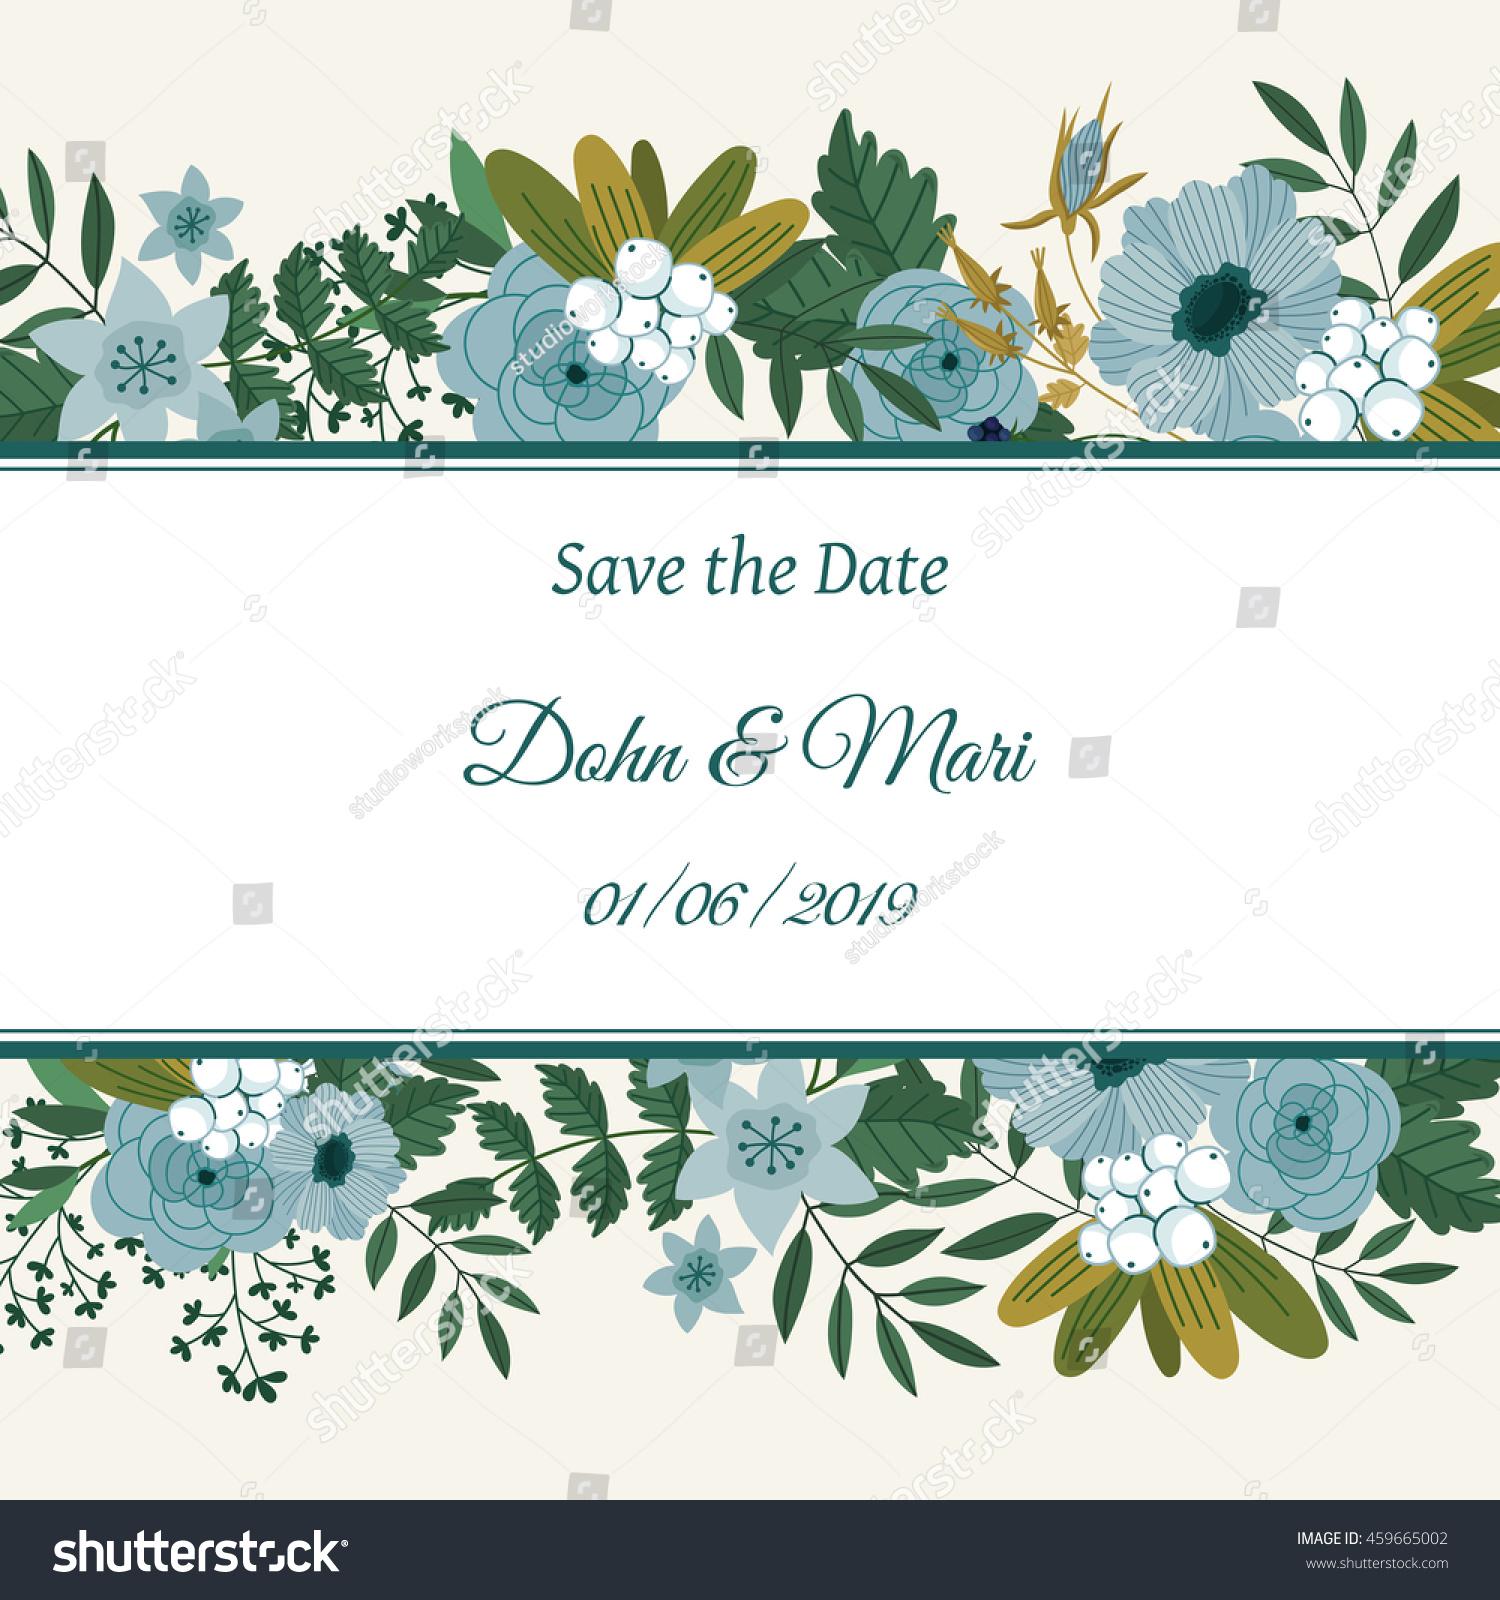 Cute wedding invitation template celebration on stock vector cute wedding invitation template to celebration on card with flower decoration vector illustration monicamarmolfo Images